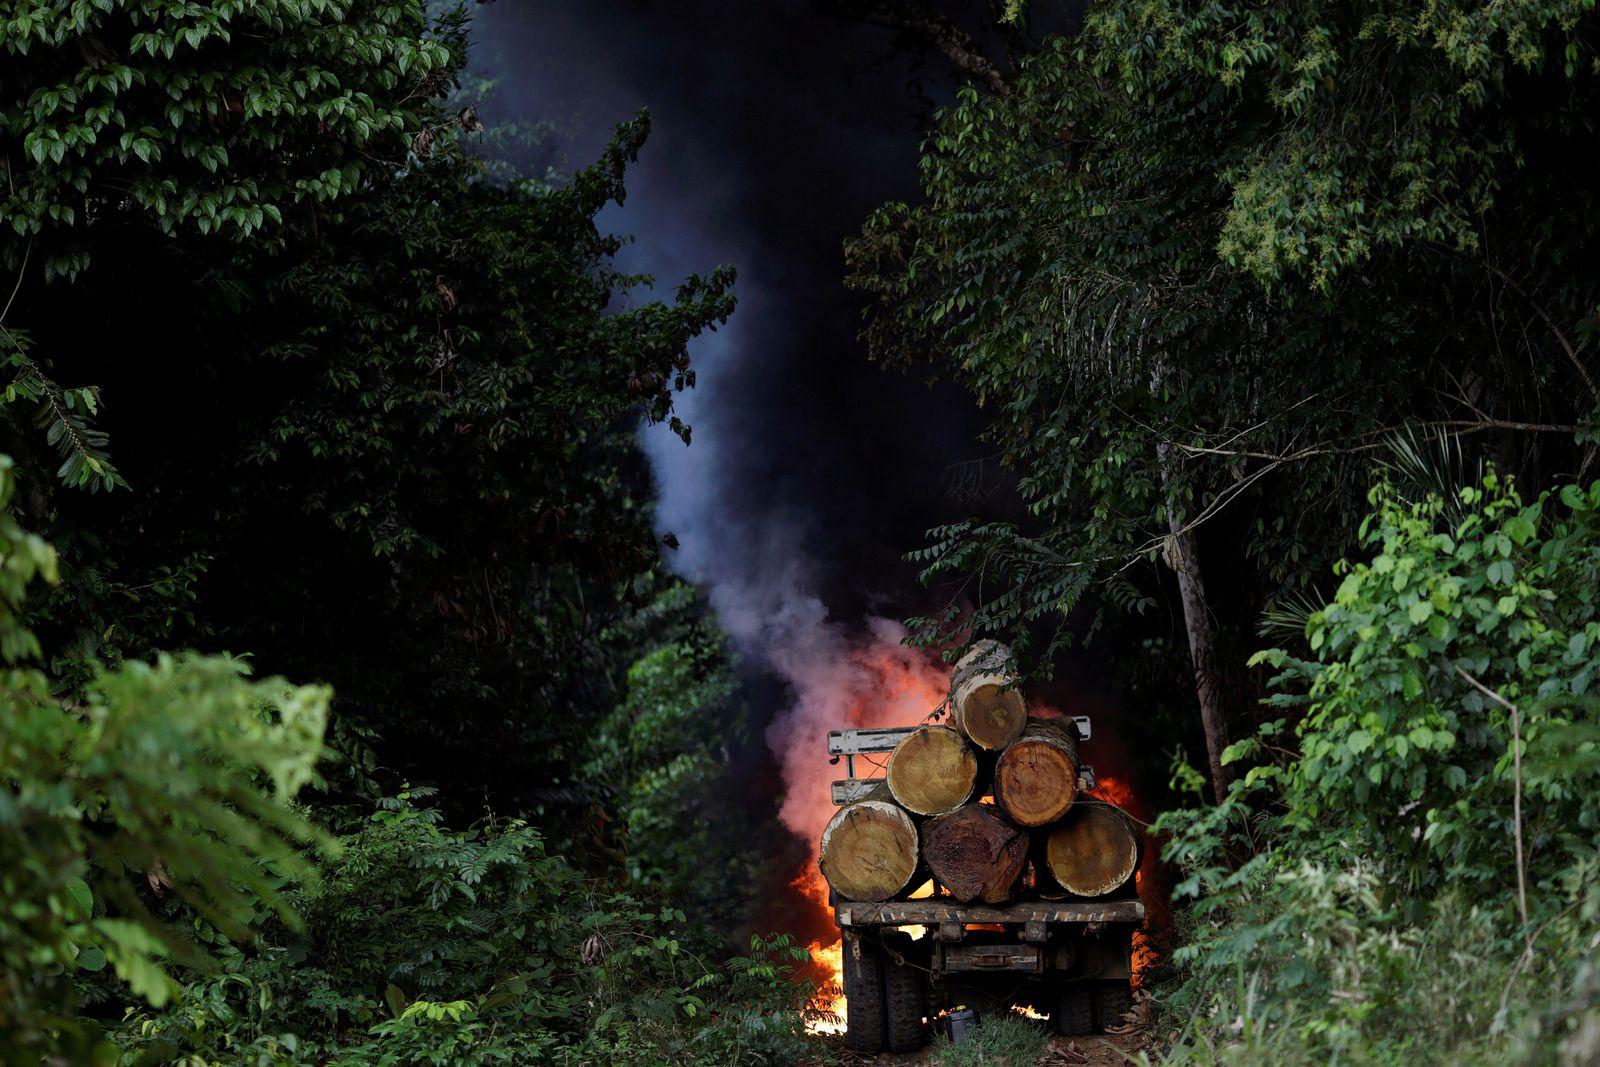 Nationalpark/ Para/ Brasilien/ Abholzung